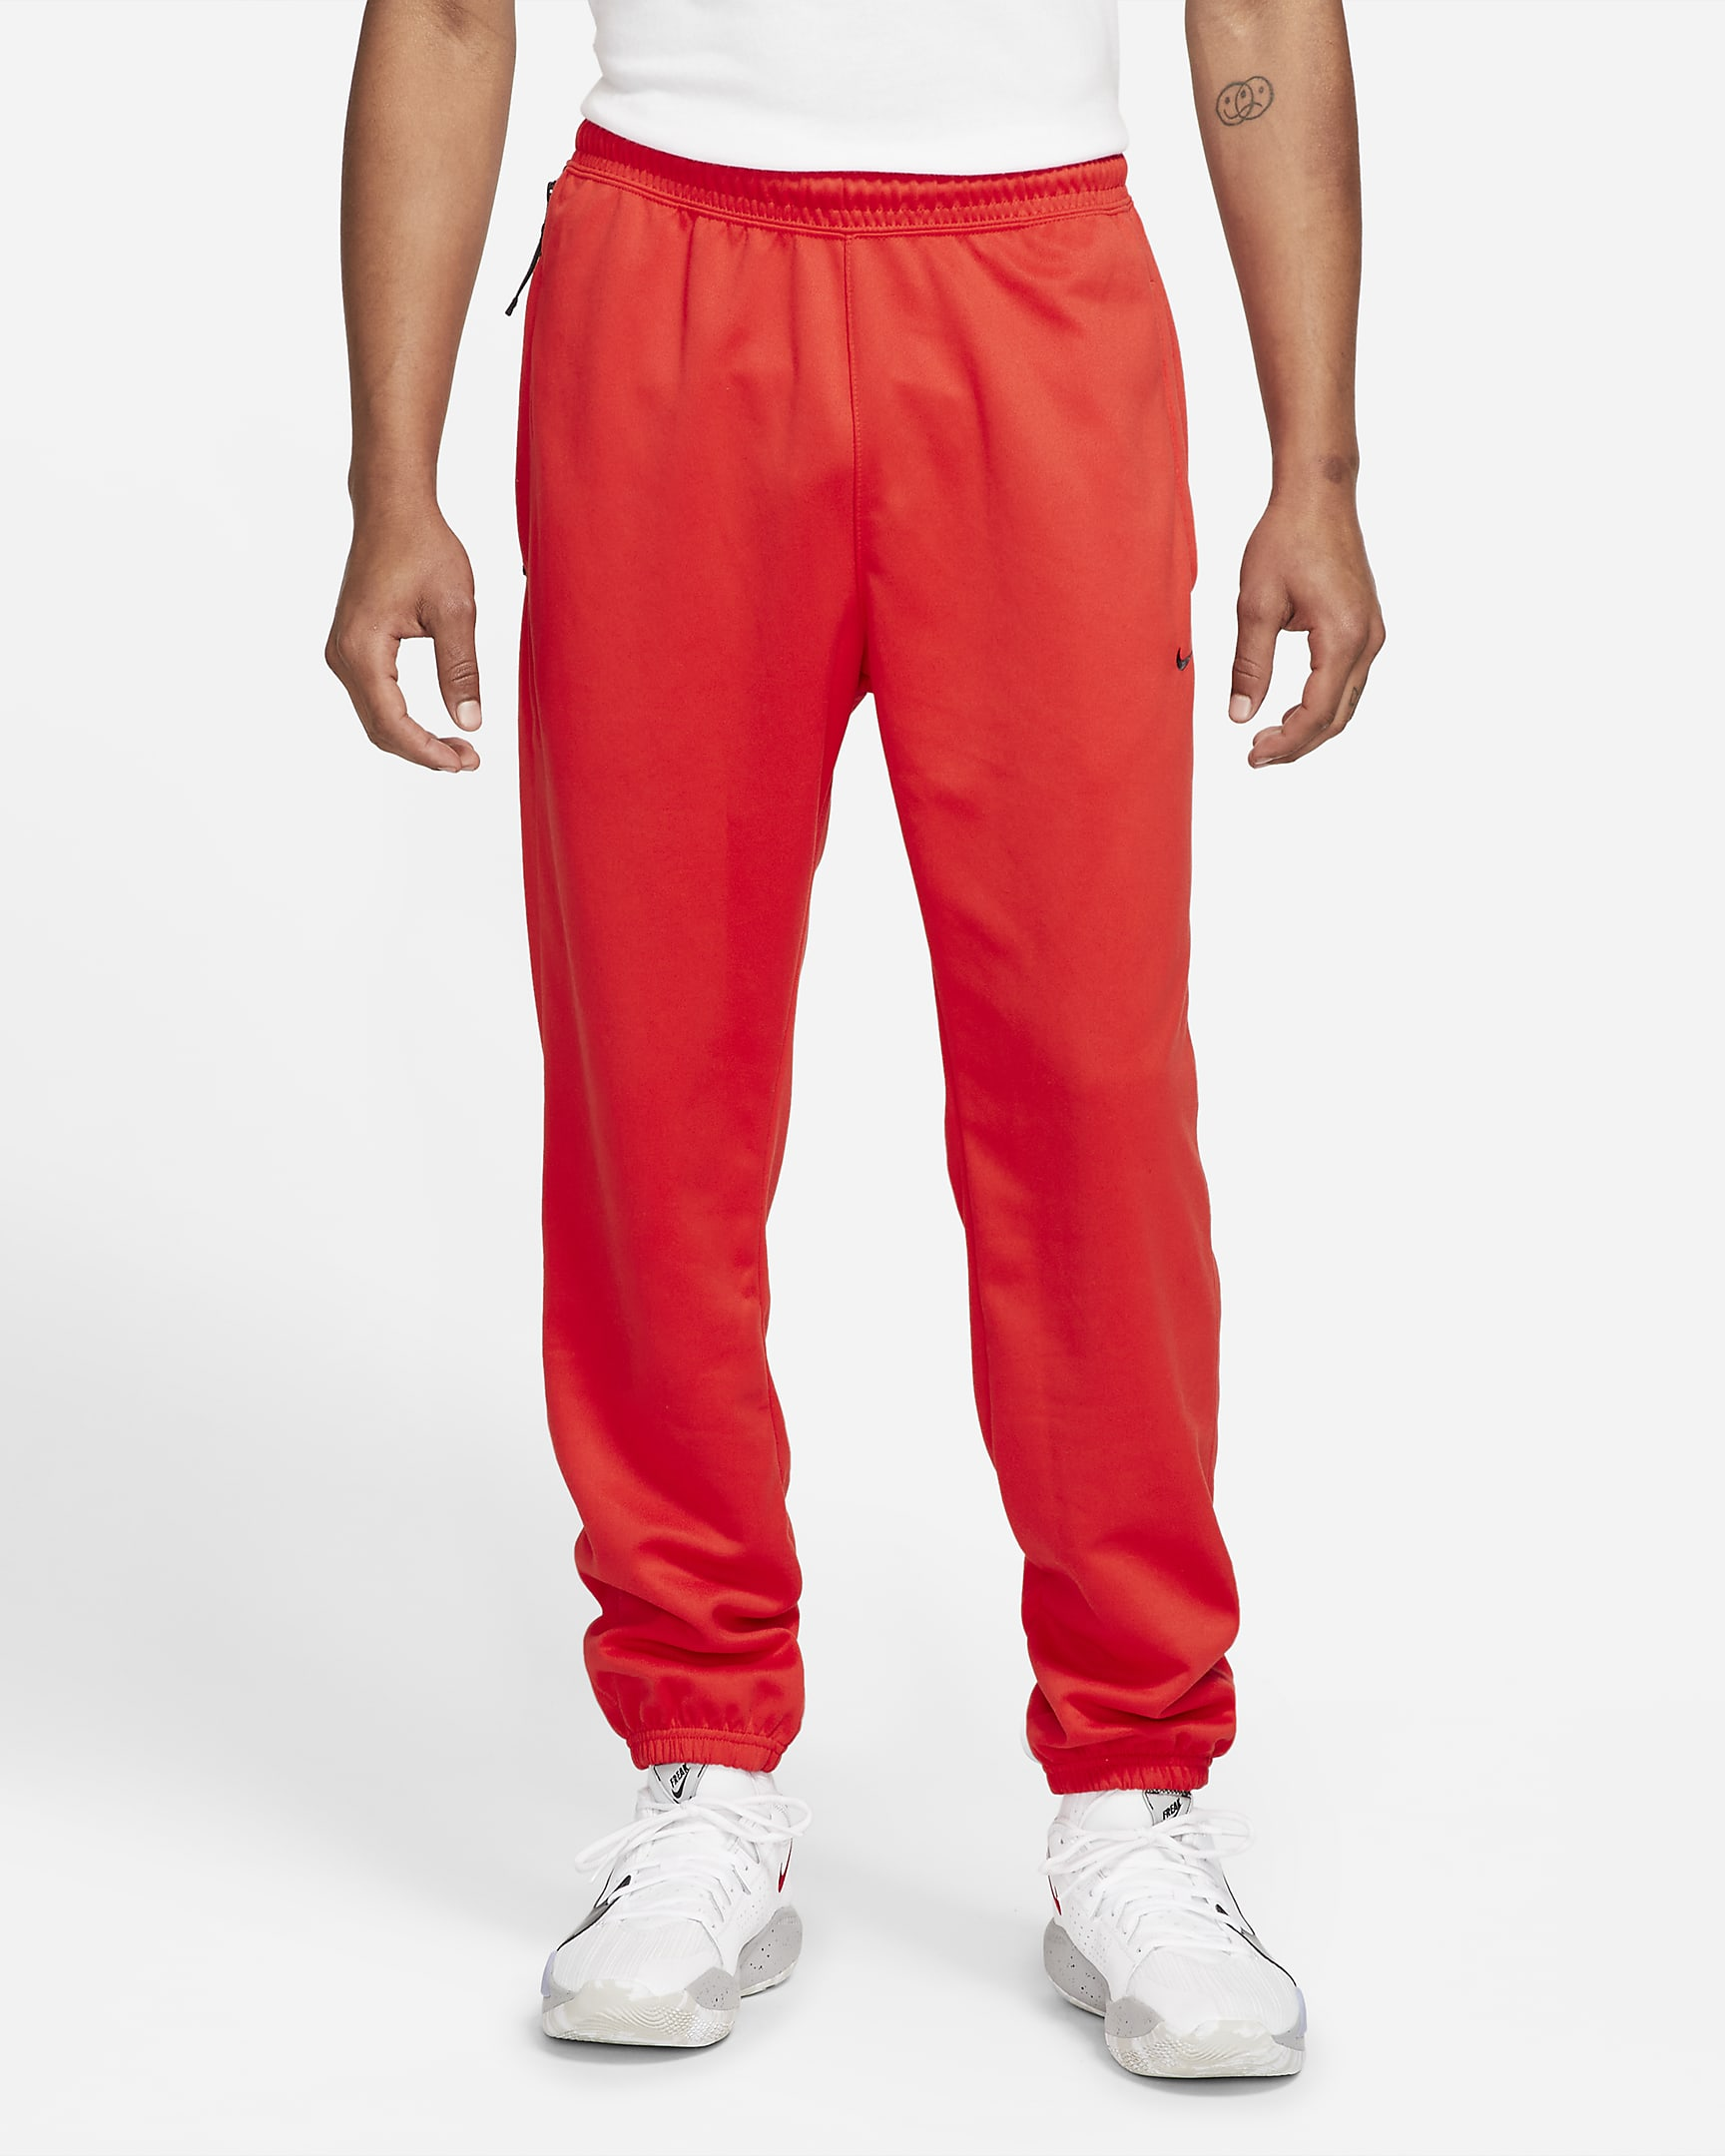 nike-spotlight-mens-basketball-pants-94tvQf.png